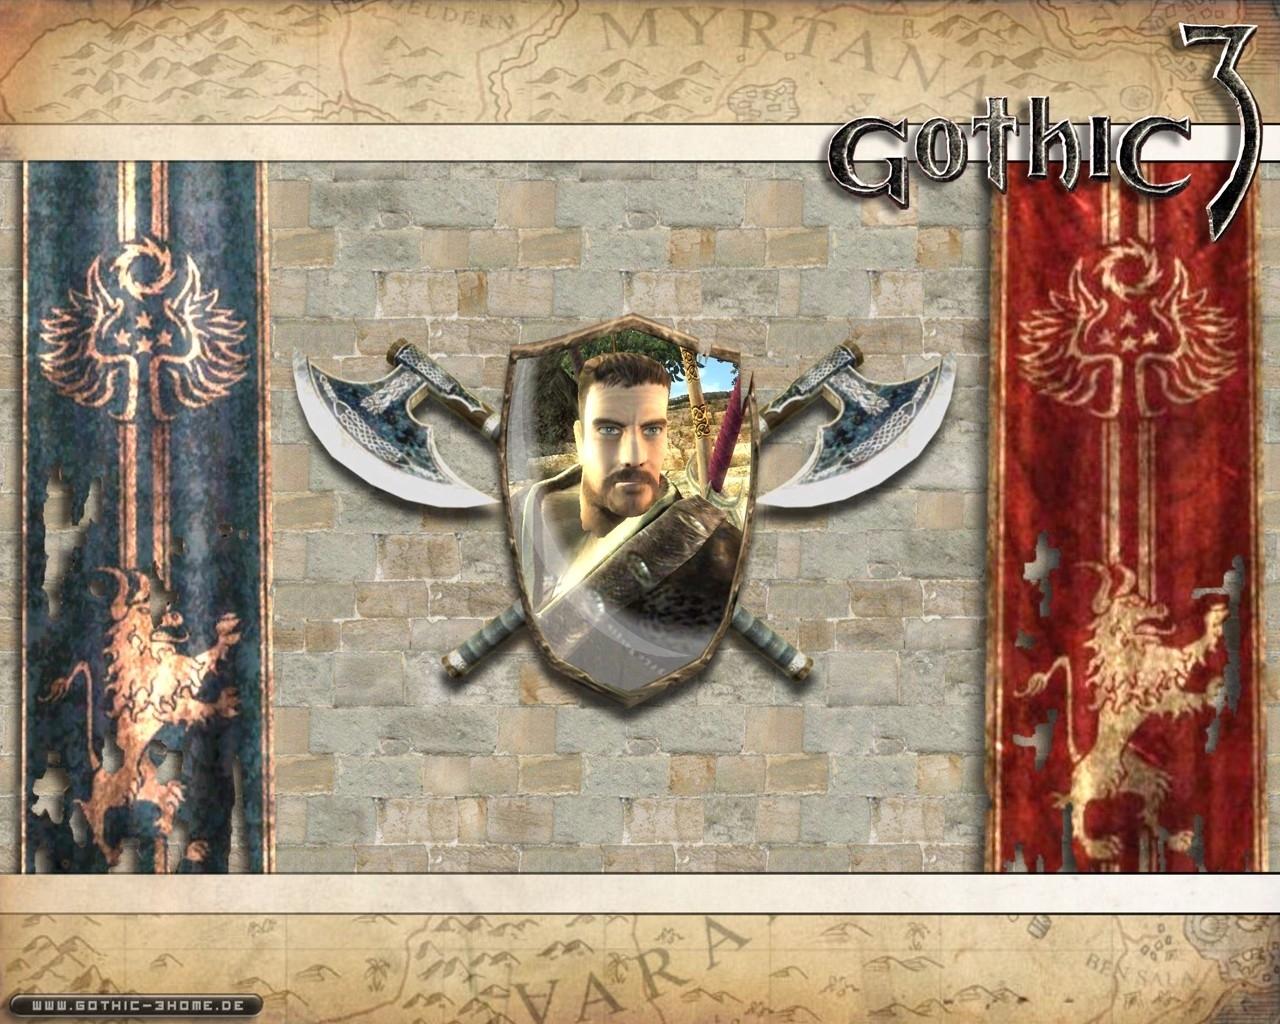 Gothic 3 wallpaper - Gothic adventskalender ...